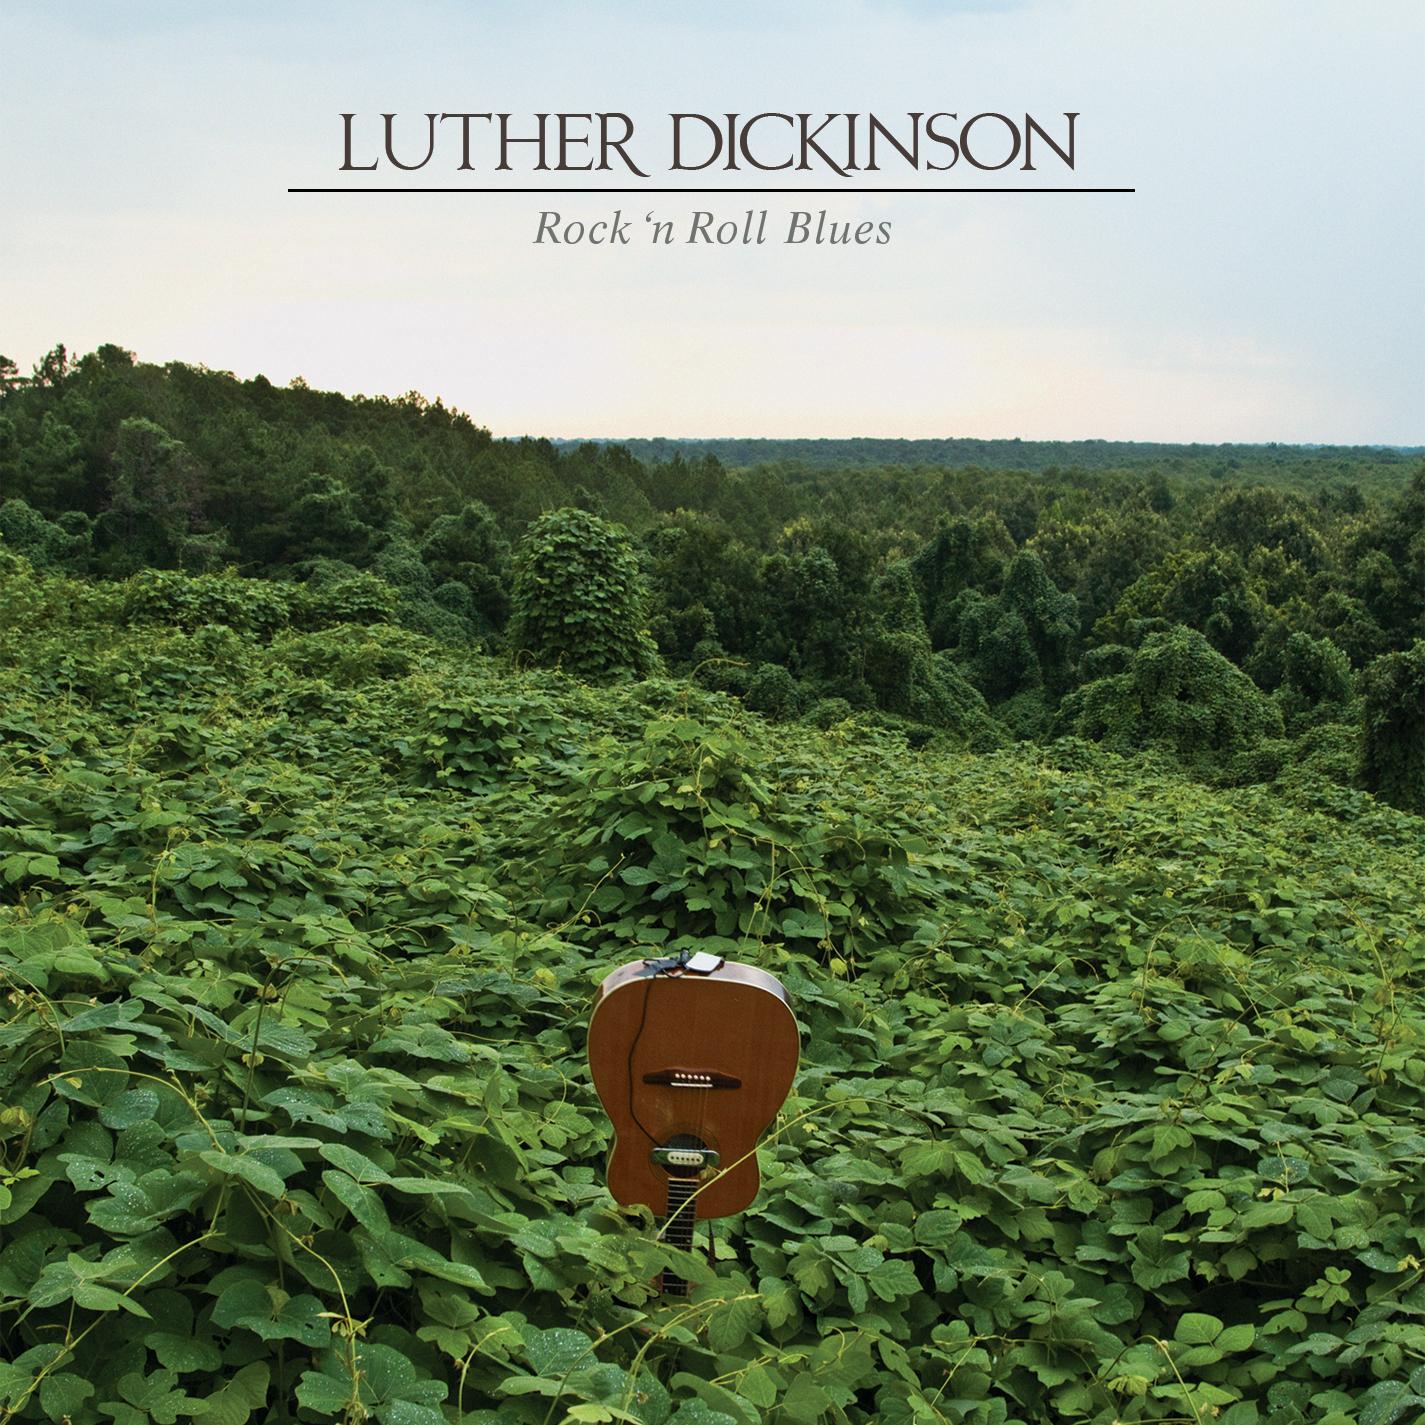 LutherDickinson-RnRBlues-ADA.jpg